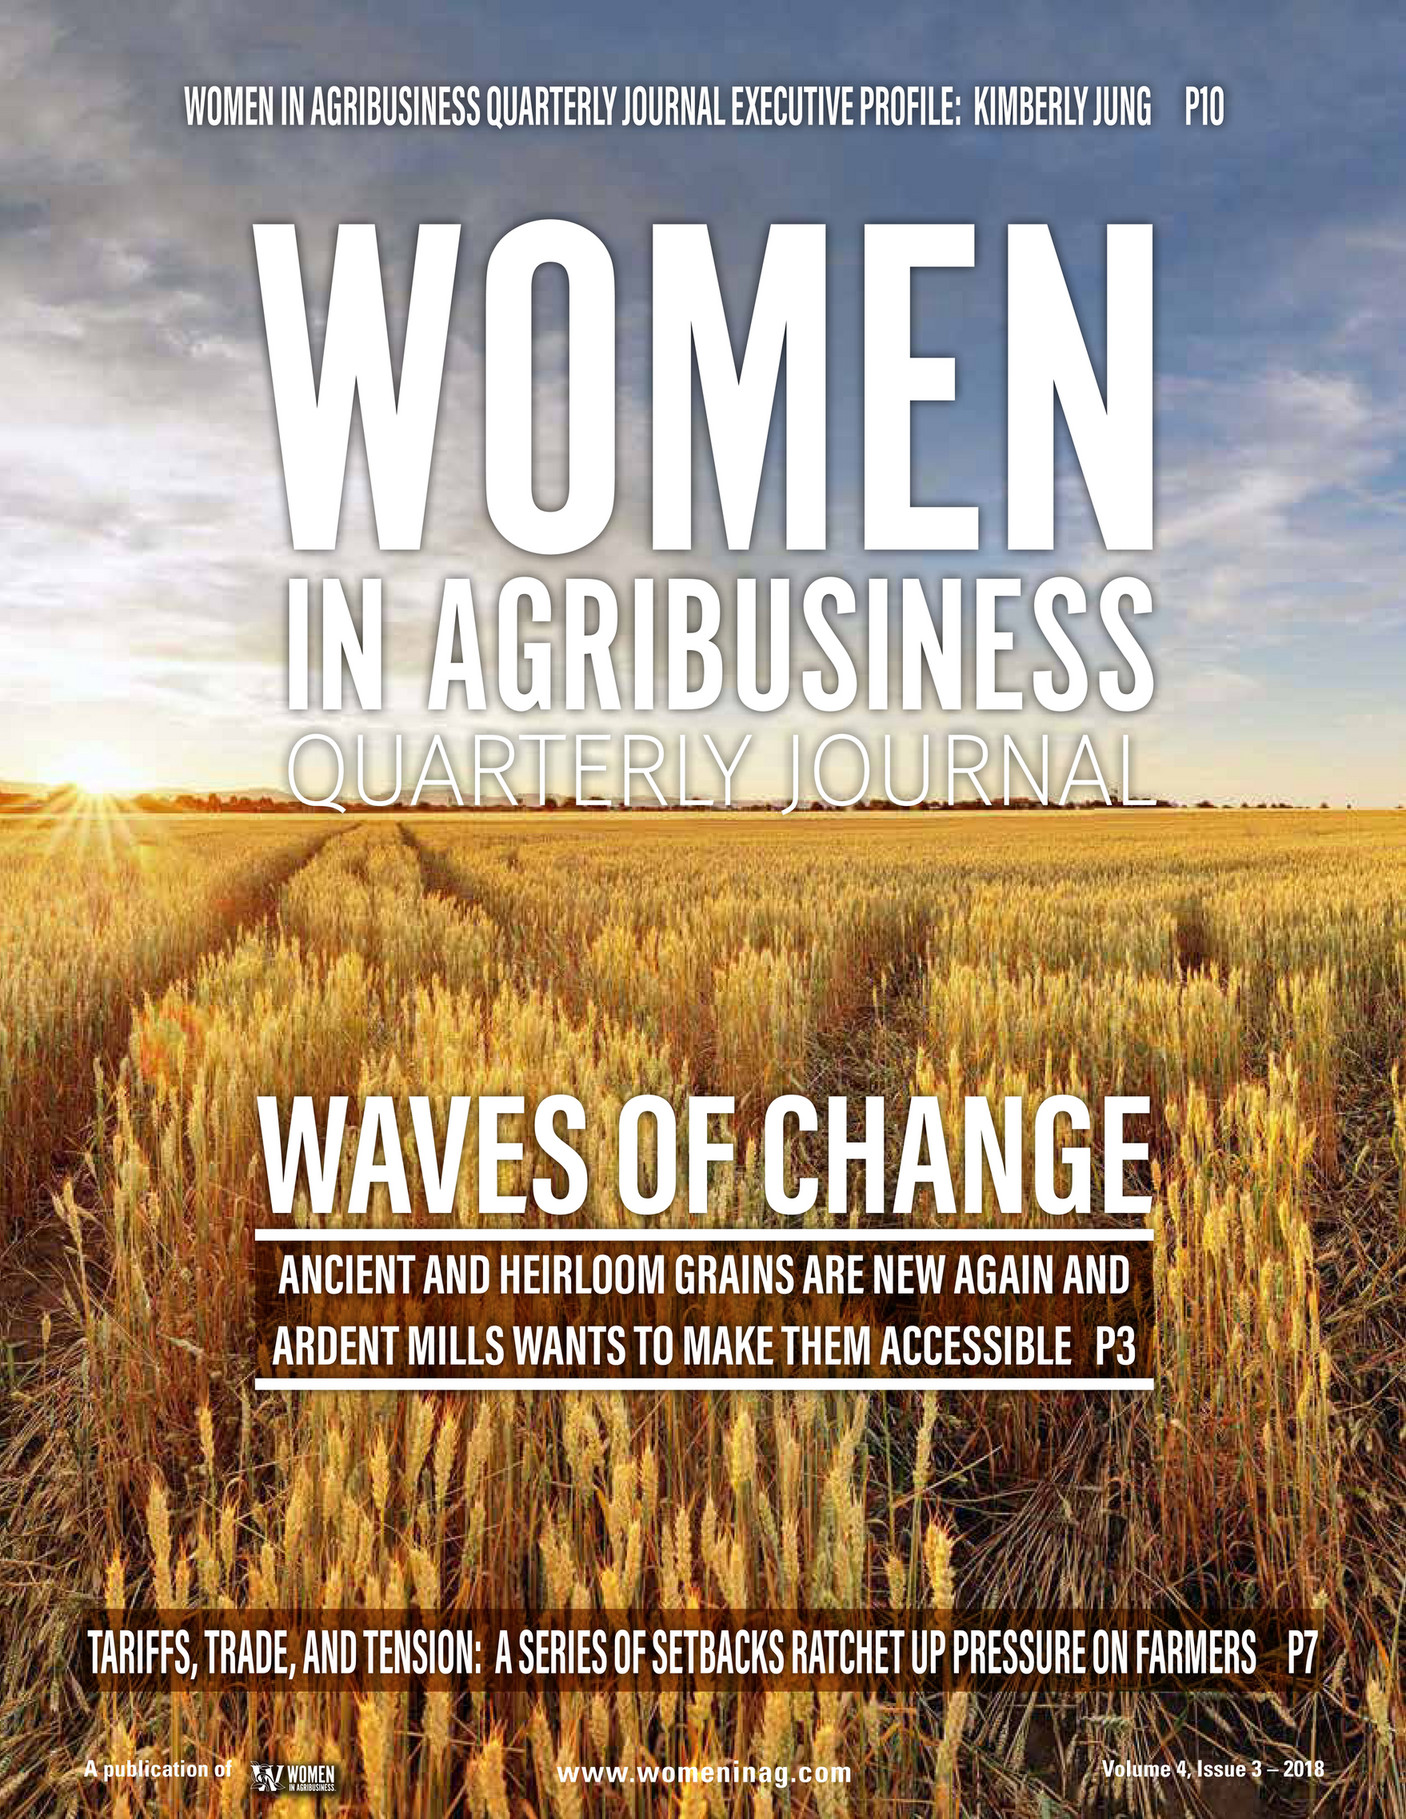 HighQuest - Women In Agribusiness Quarterly Journal - Volume